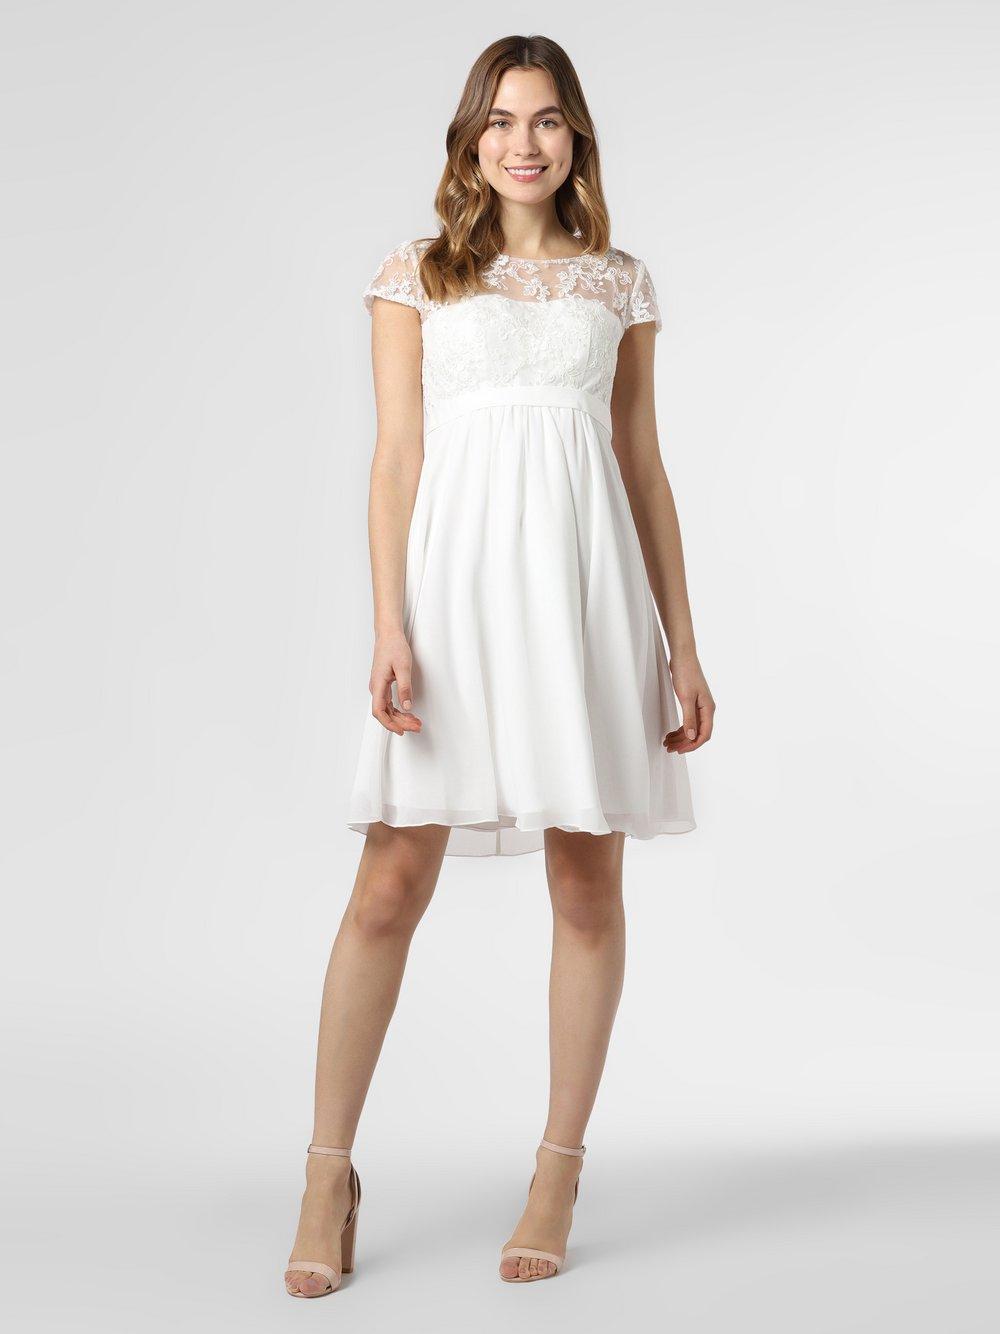 Luxuar Fashion – Damska suknia ślubna, beżowy Van Graaf 459213-0001-00360